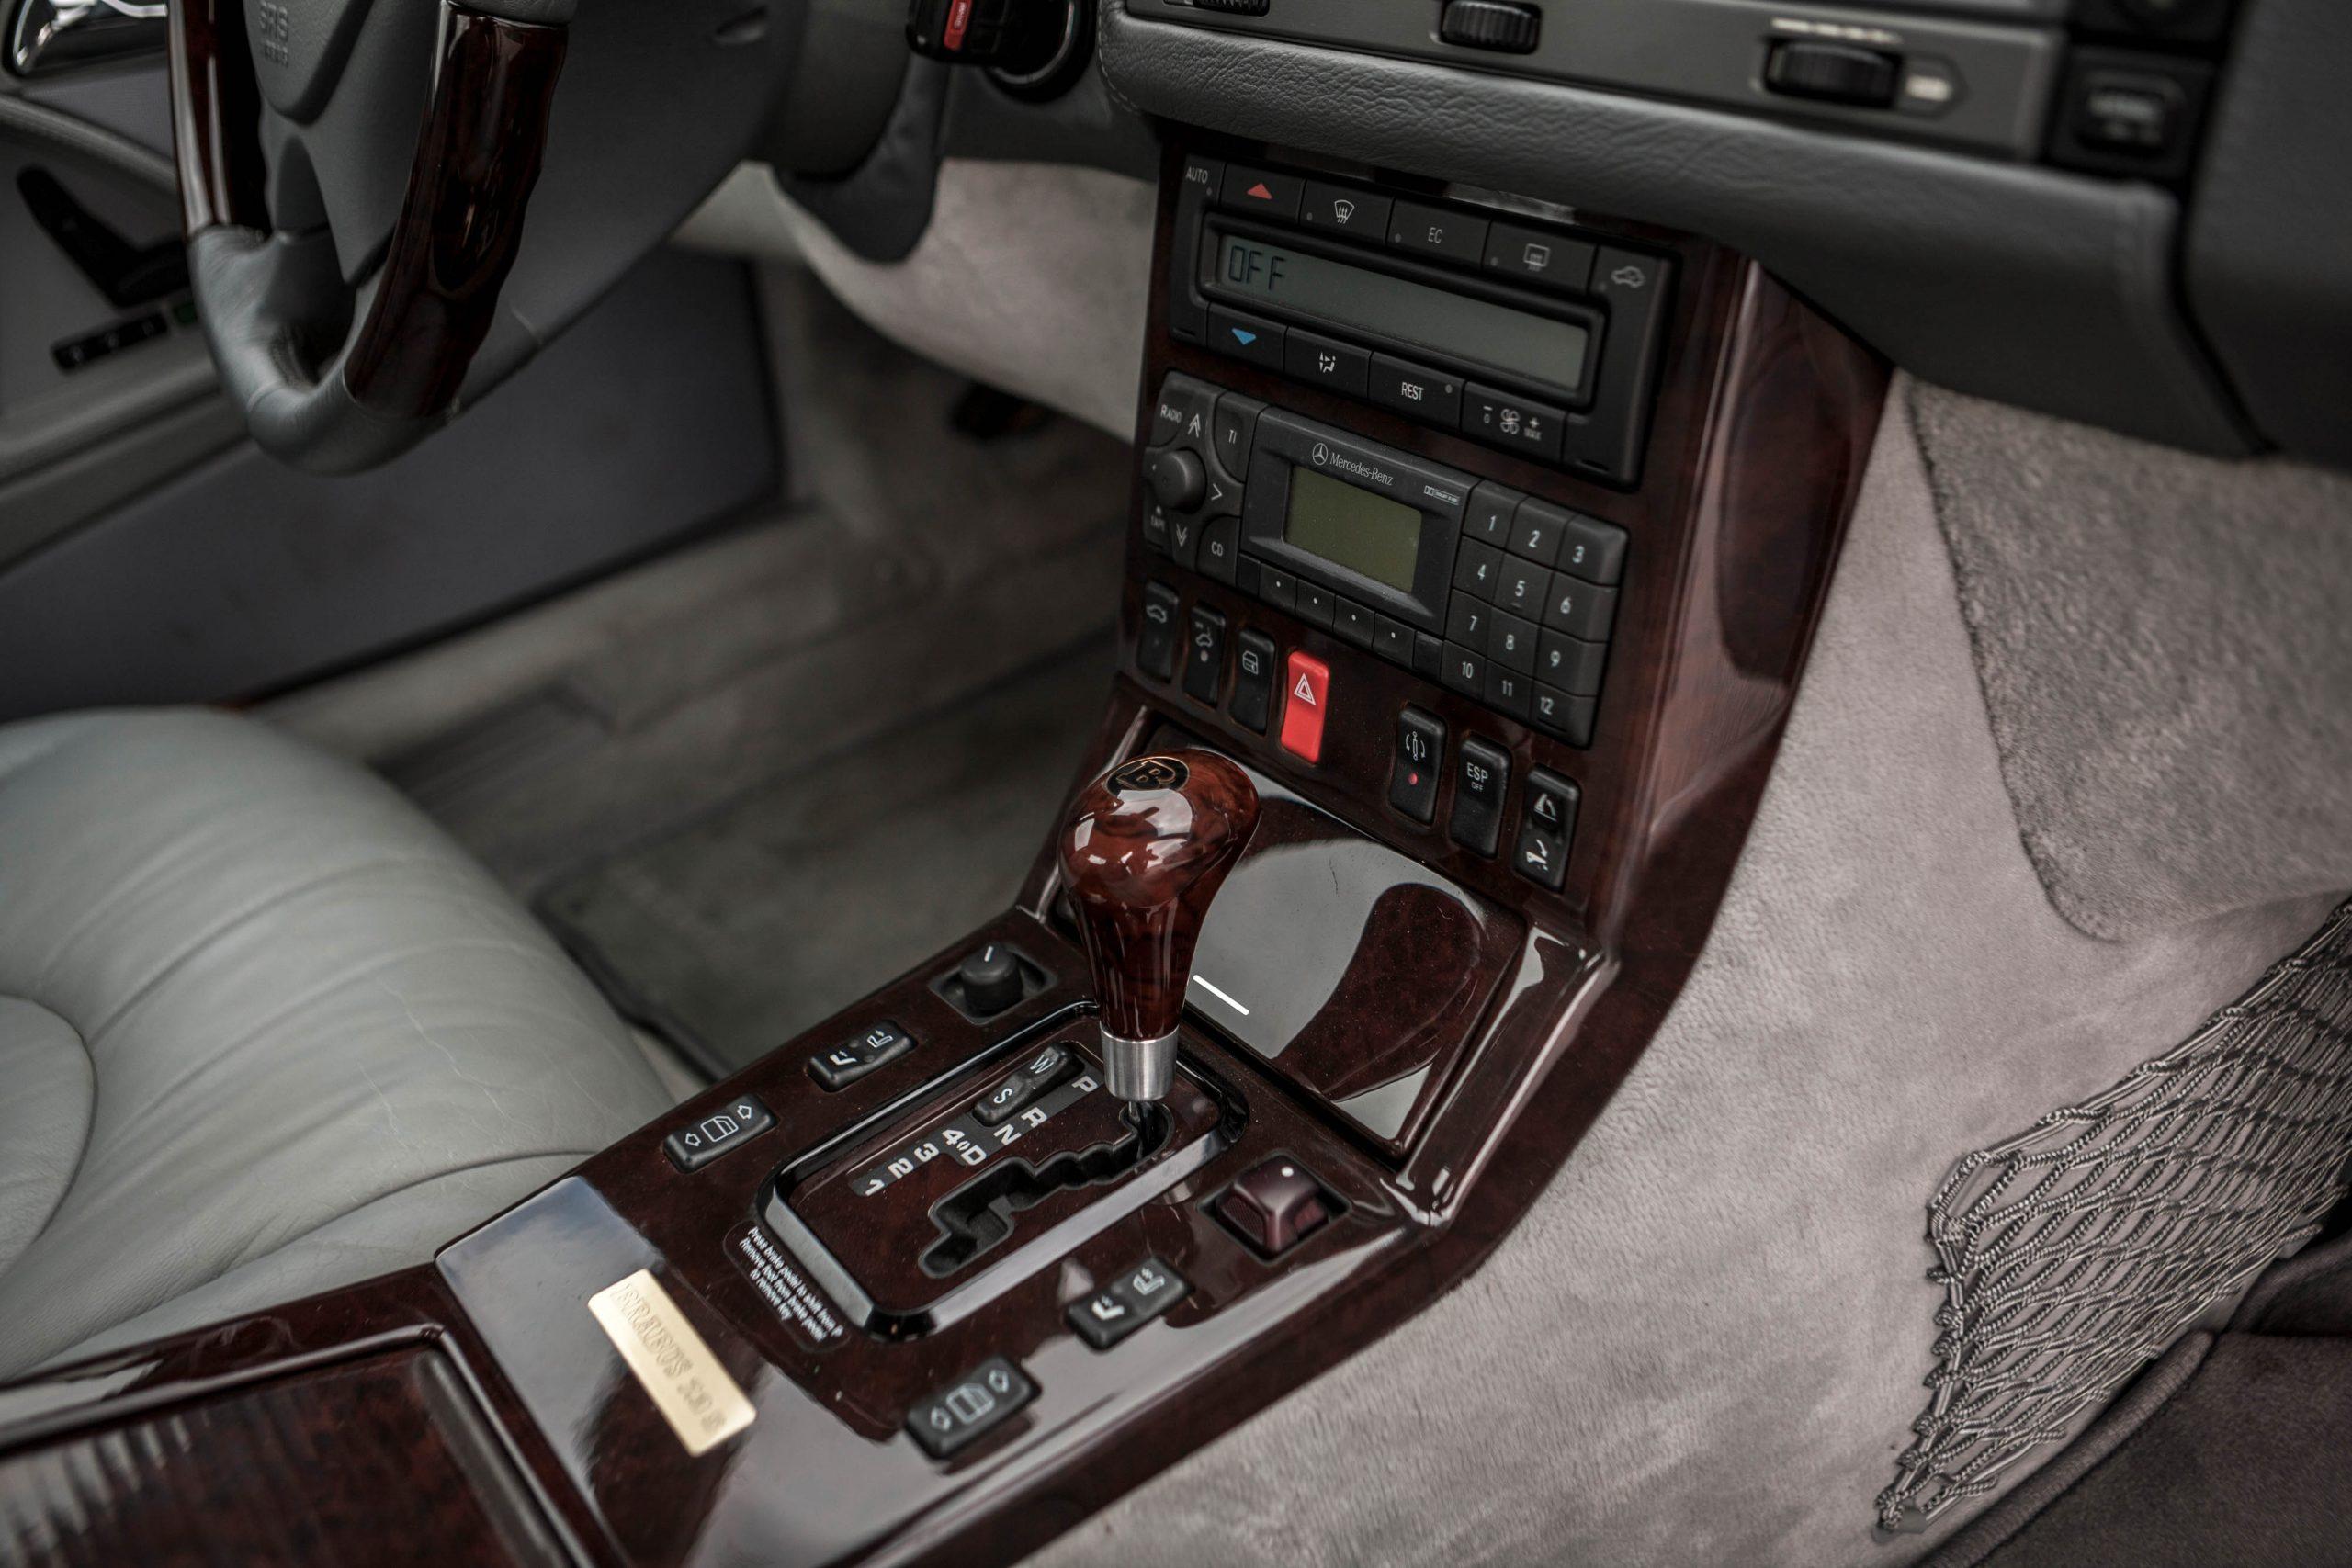 1999 Mercedes-Benz Brabus 7.3 S interior console